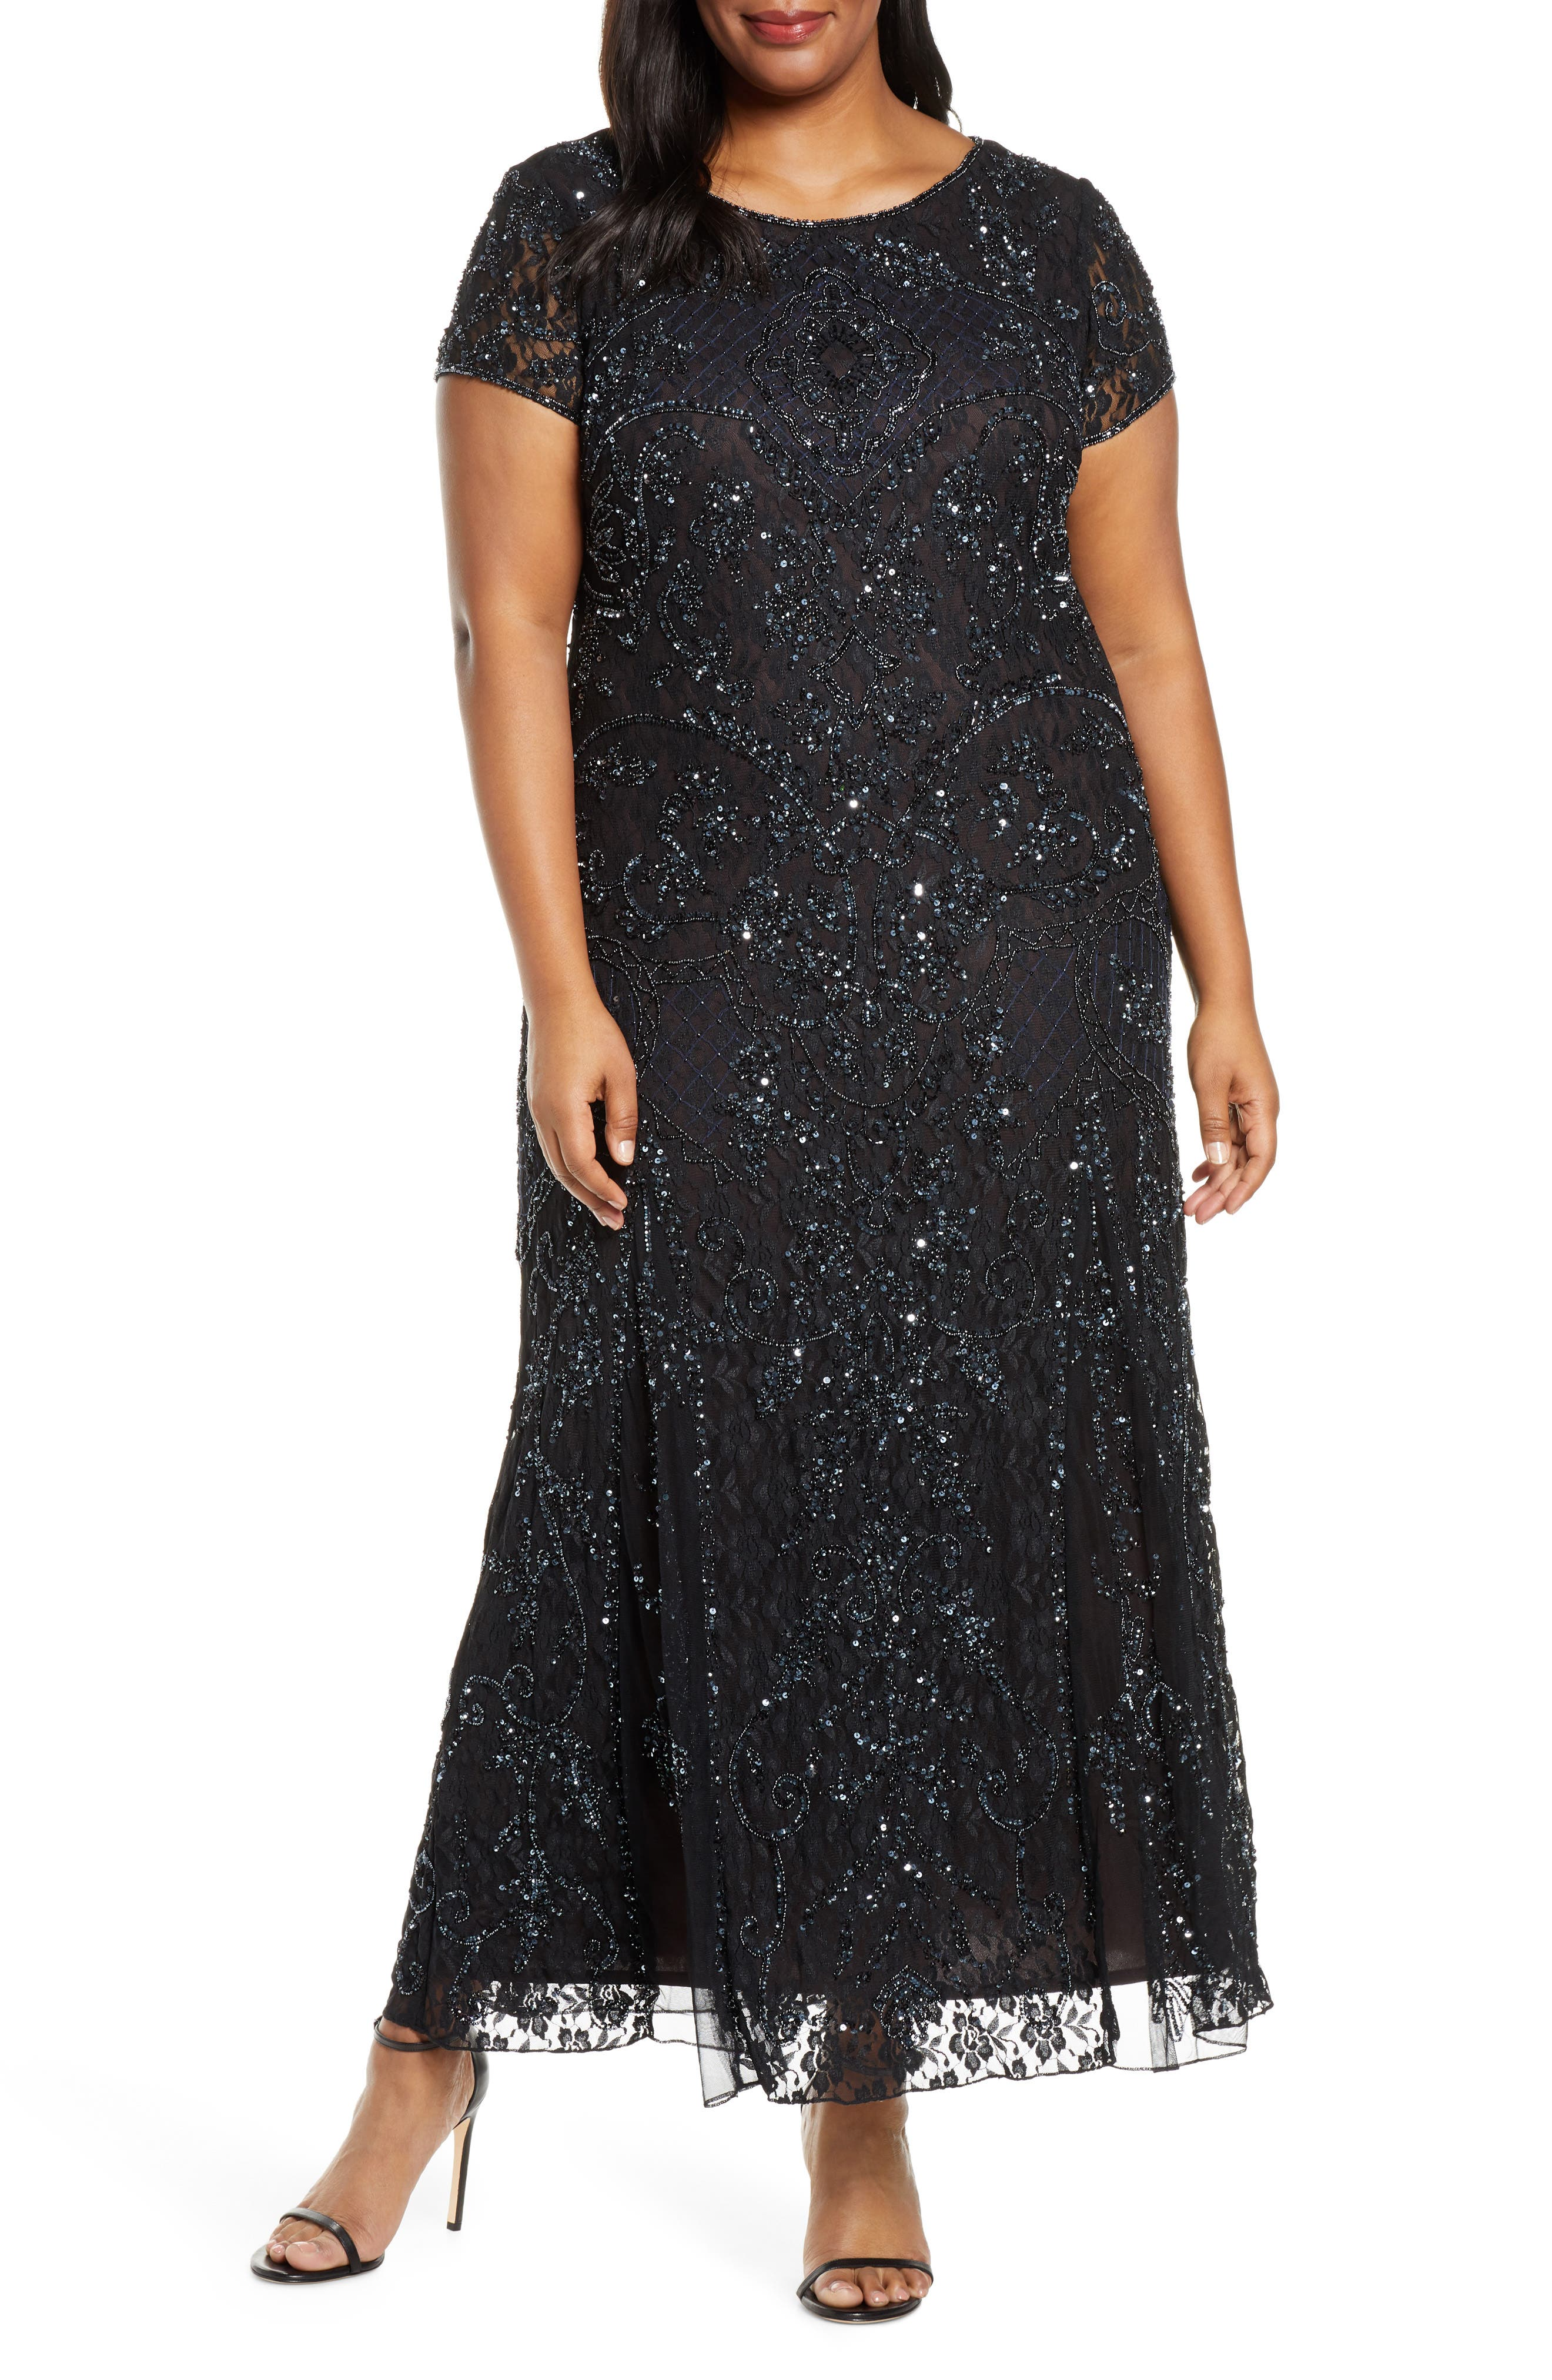 Authentic 1920s Makeup Tutorial Plus Size Womens Pisarro Nights Embellished Lace A-Line Dress Size 14W - Black $258.00 AT vintagedancer.com